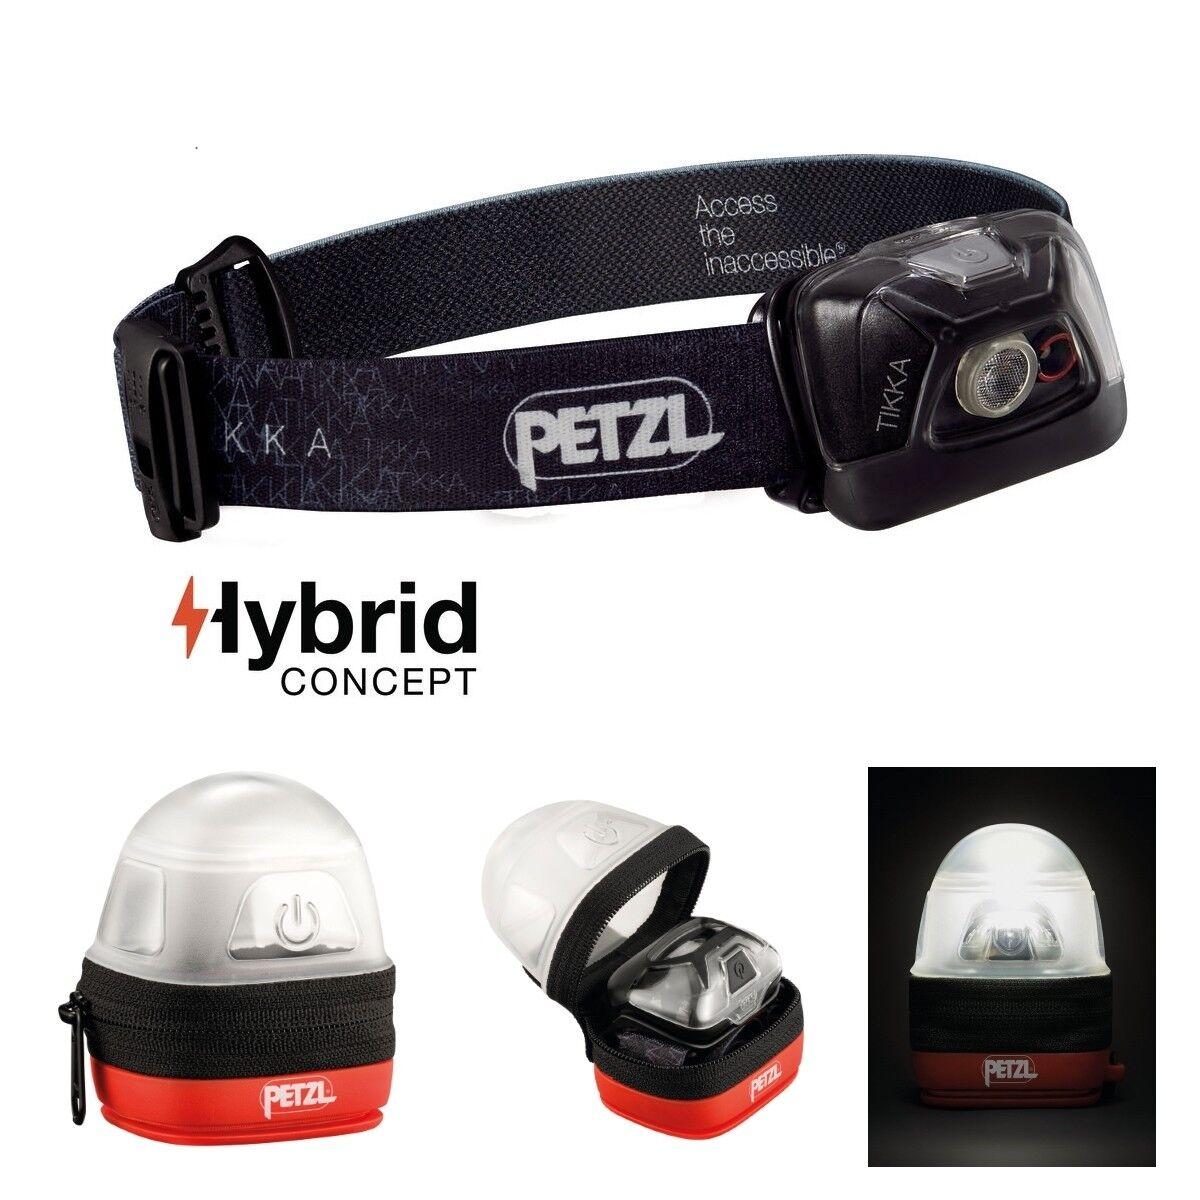 Petzl Linterna Tikka negro-max. 200 Lumen incl. Petzl noctilight schutz-etui